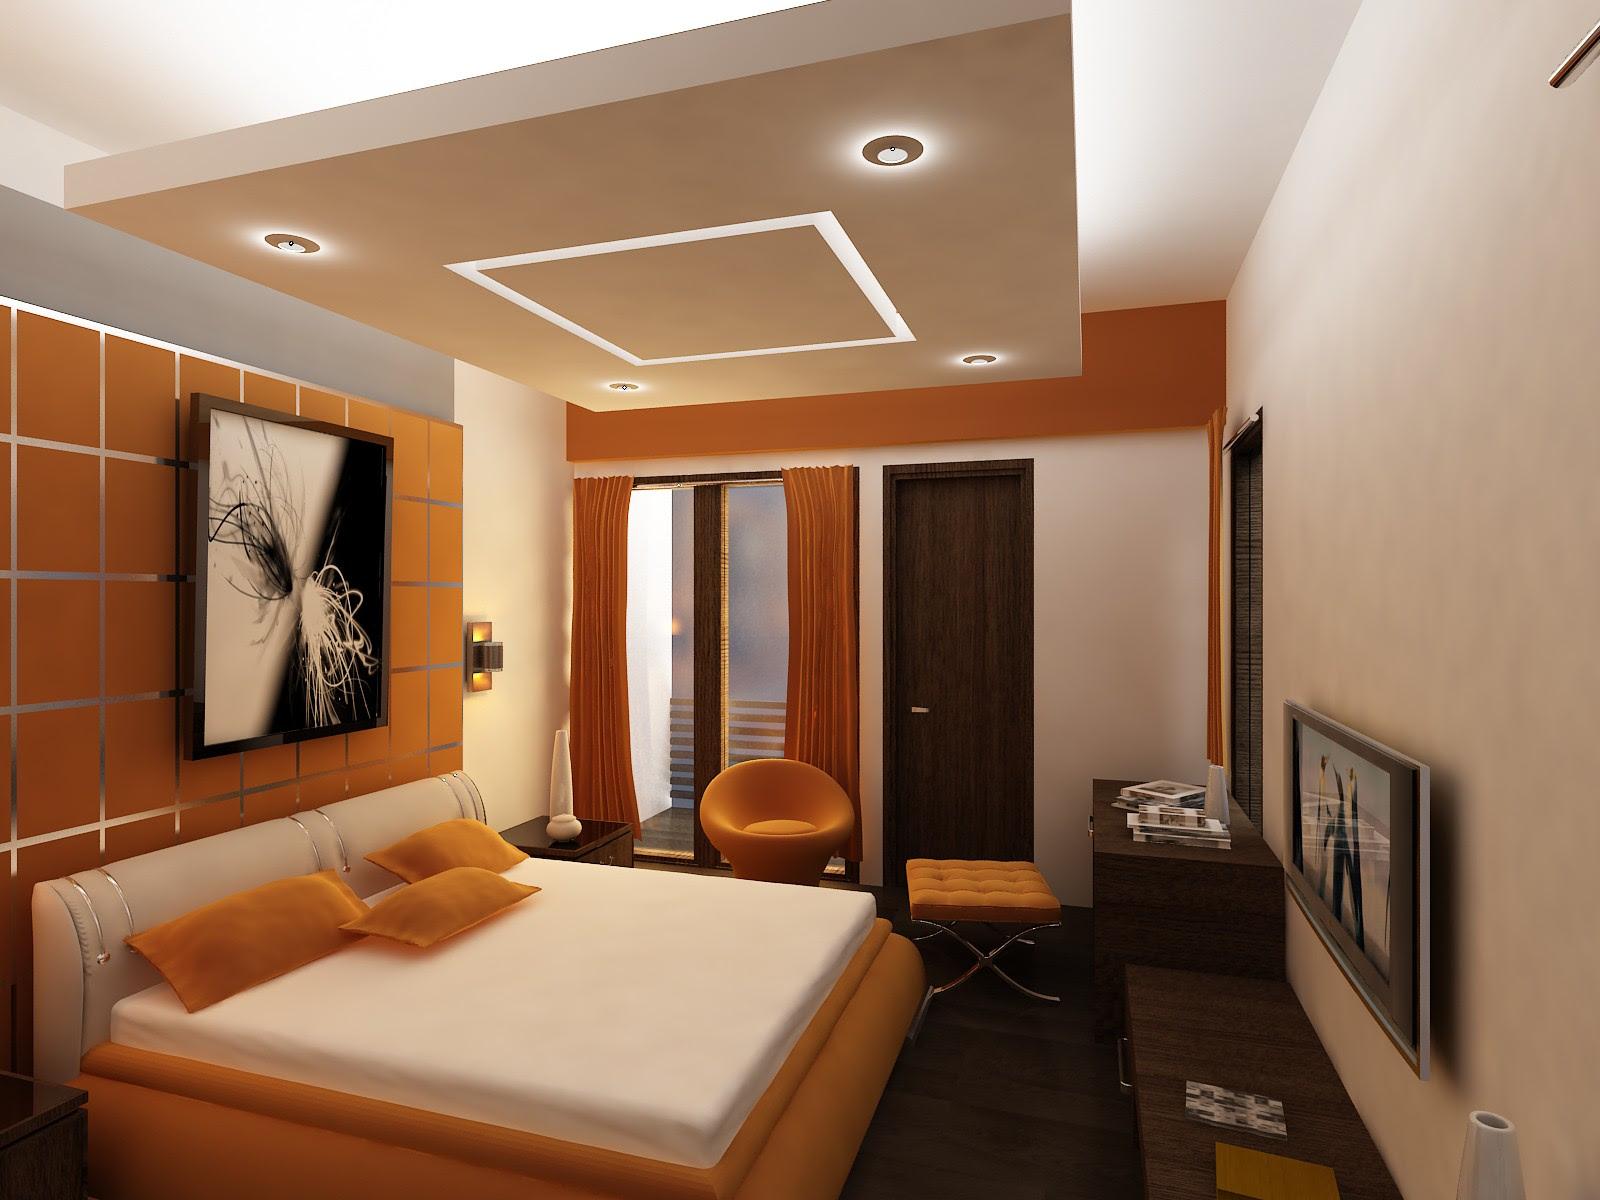 Contoh Plafon Kamar Tidur - Desain plafon kamar tidur